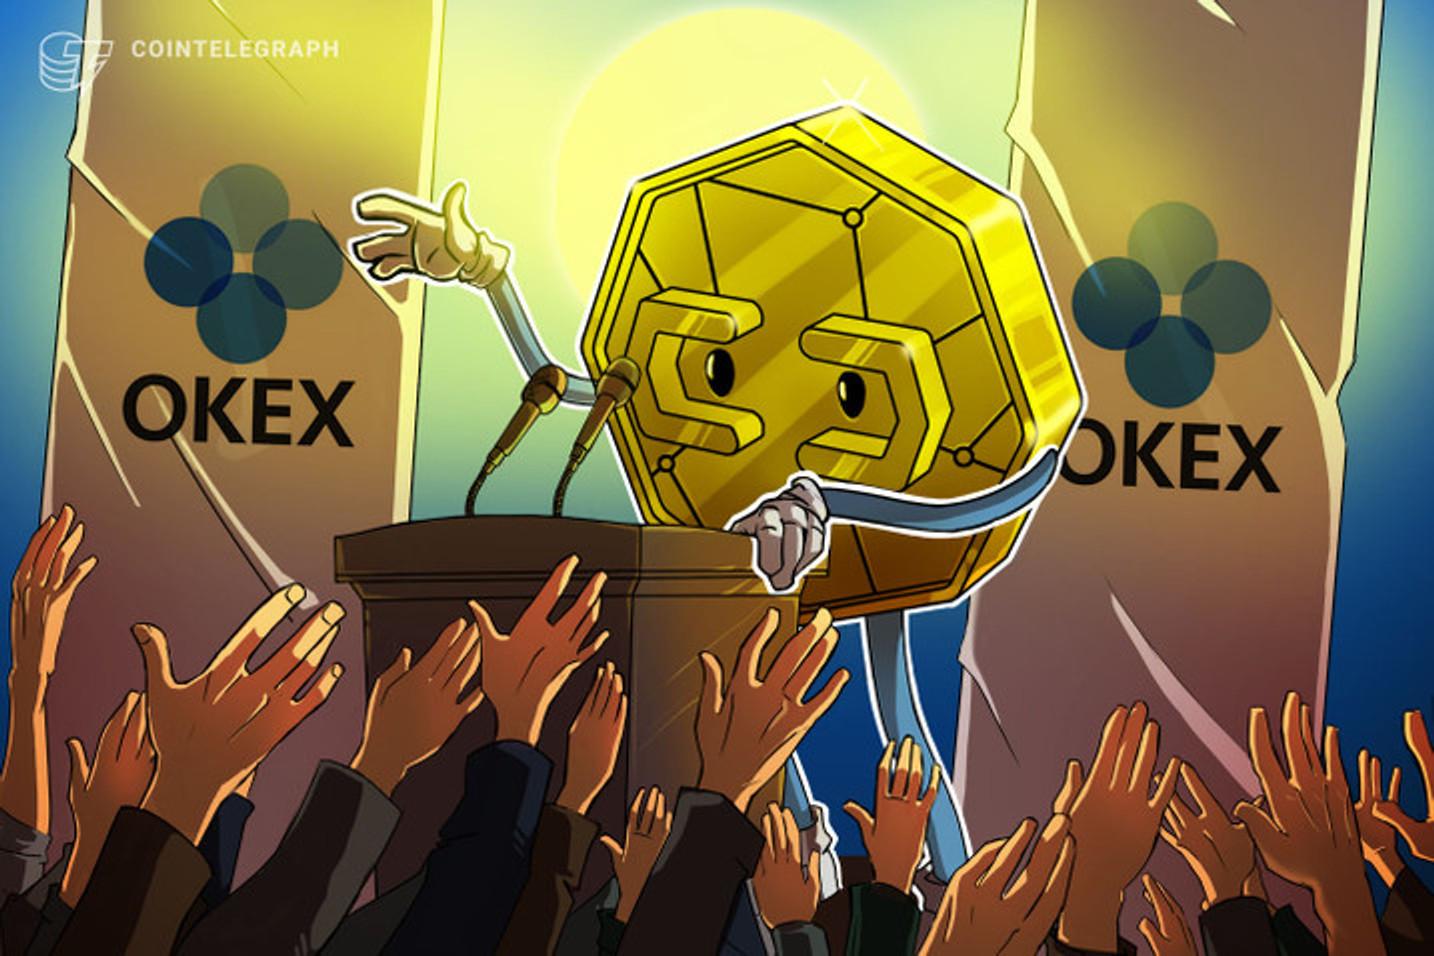 OKEx anuncia eventos educativos enfocados en Latinoamérica sobre criptomonedas y trading